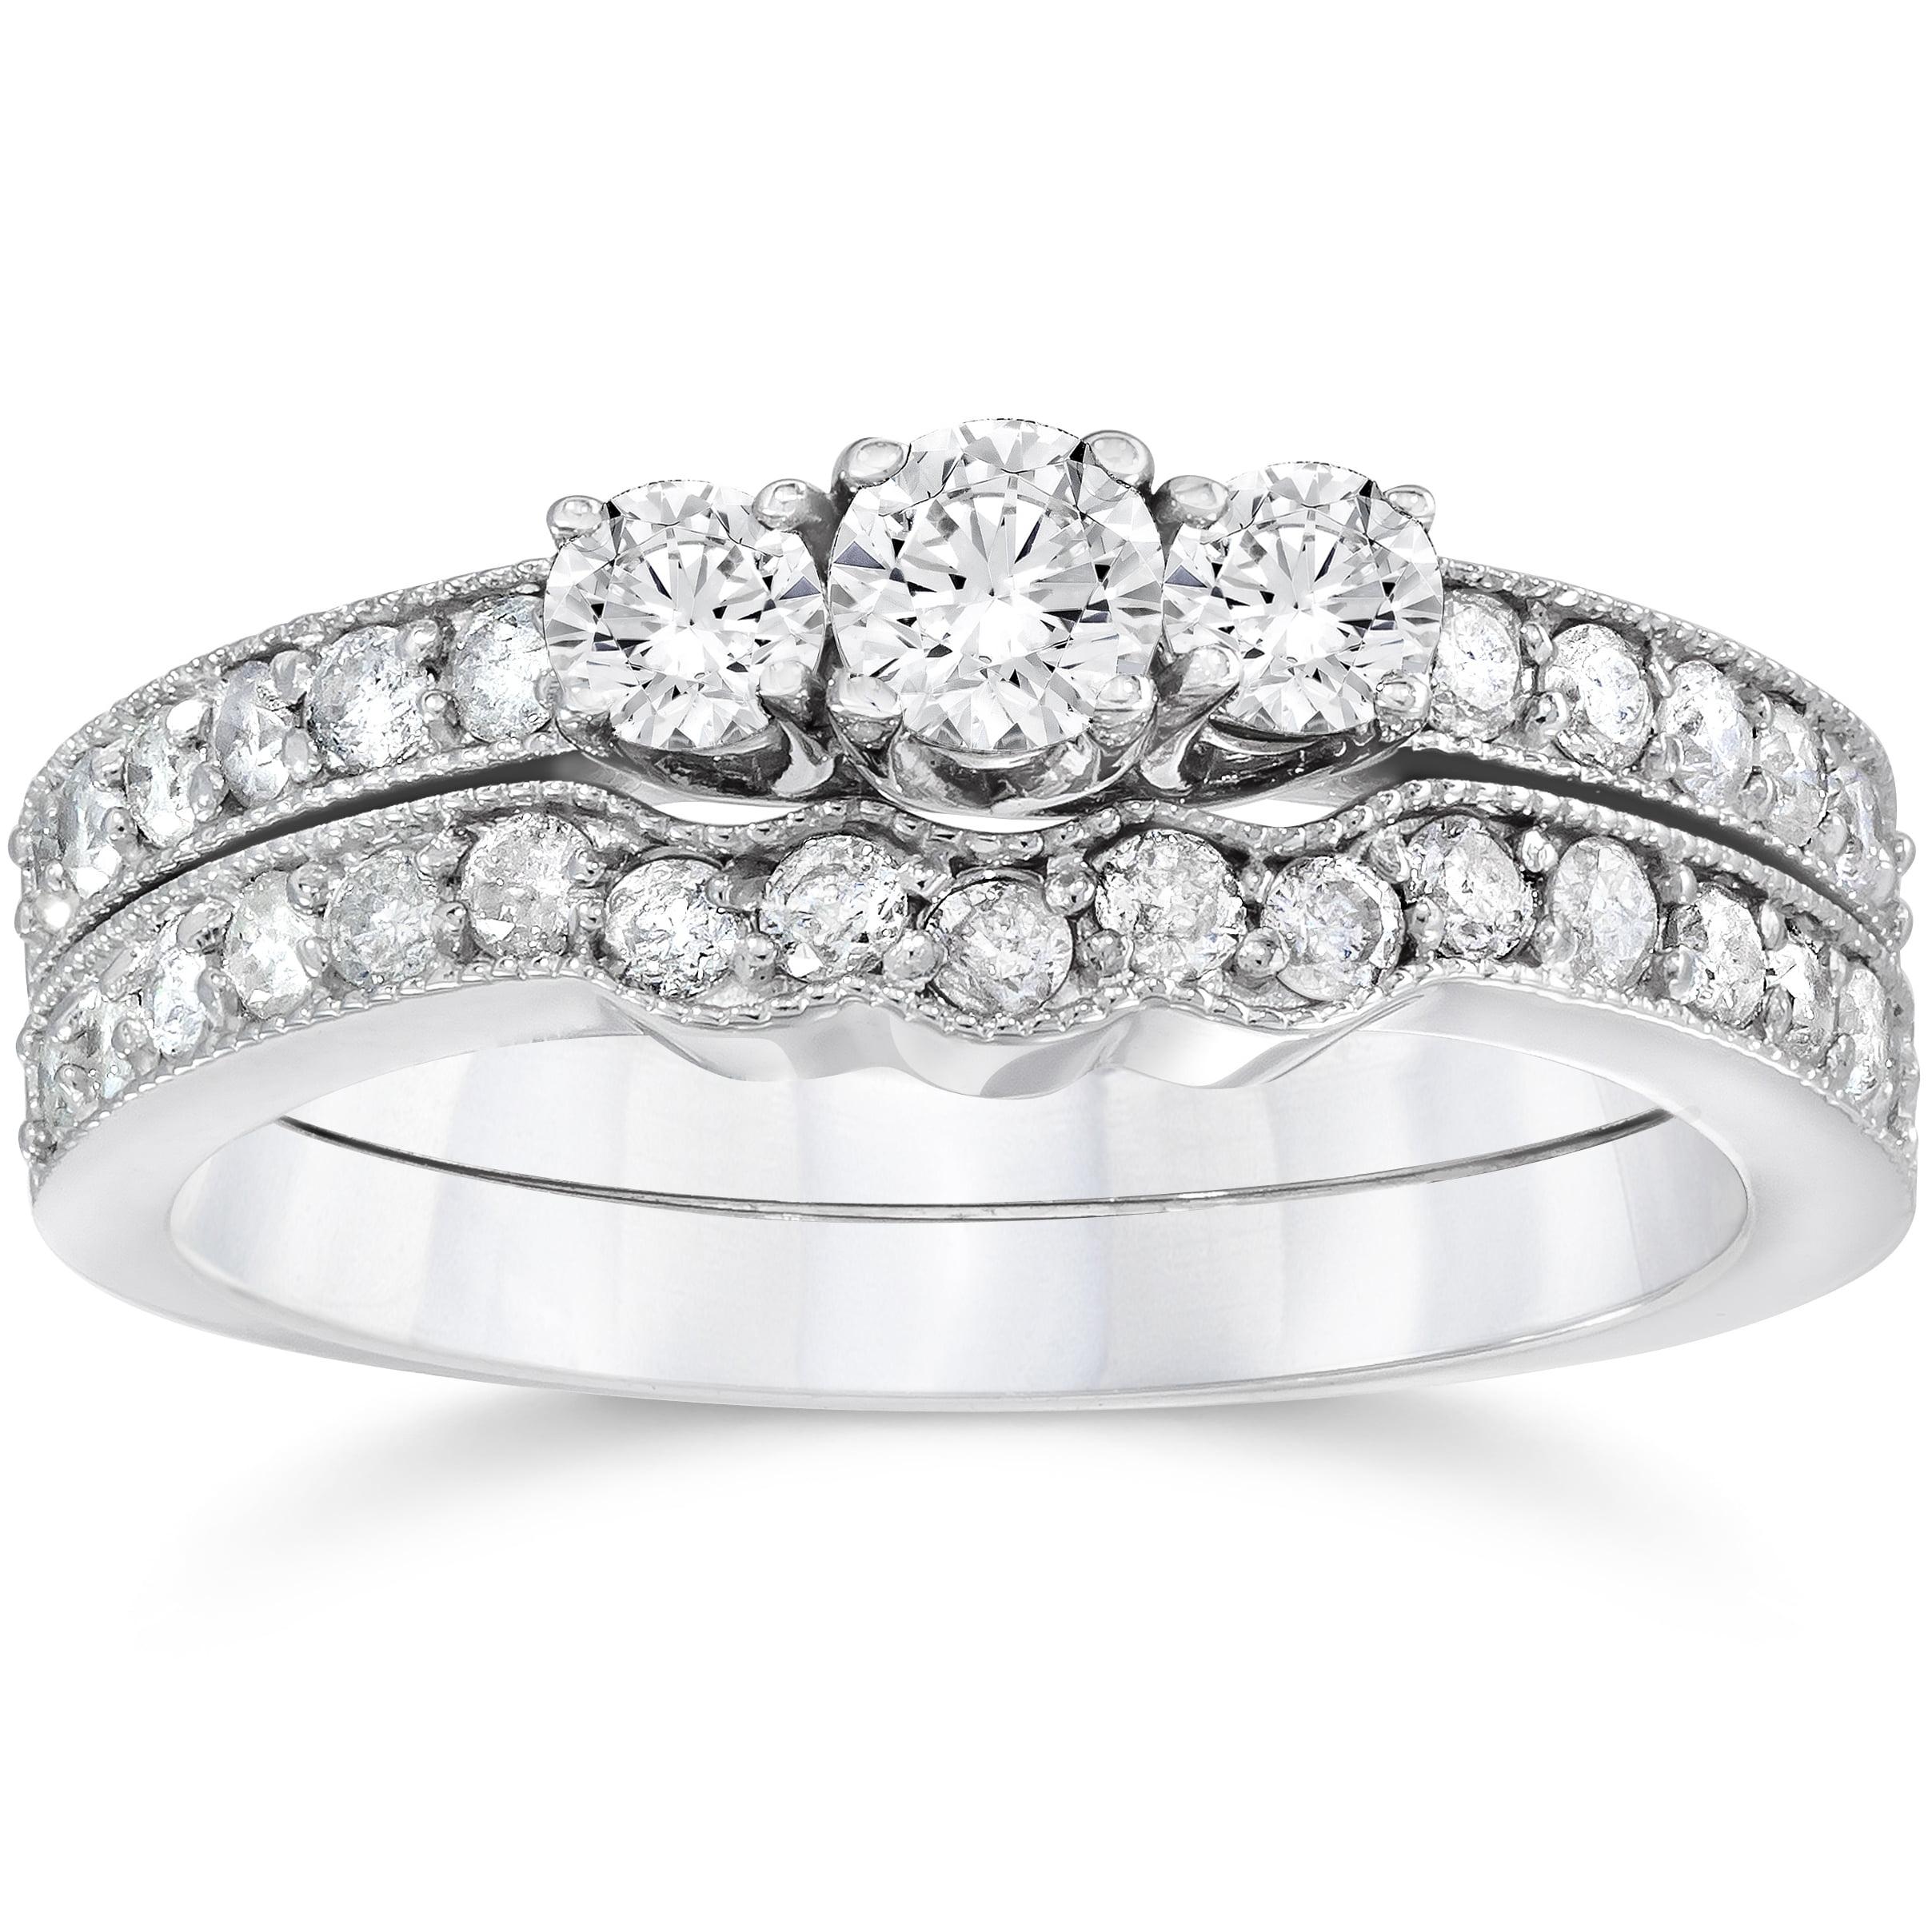 3 4ct Three Stone Vintage Diamond Engagement Wedding Ring Set 10K White Gold by Pompeii3